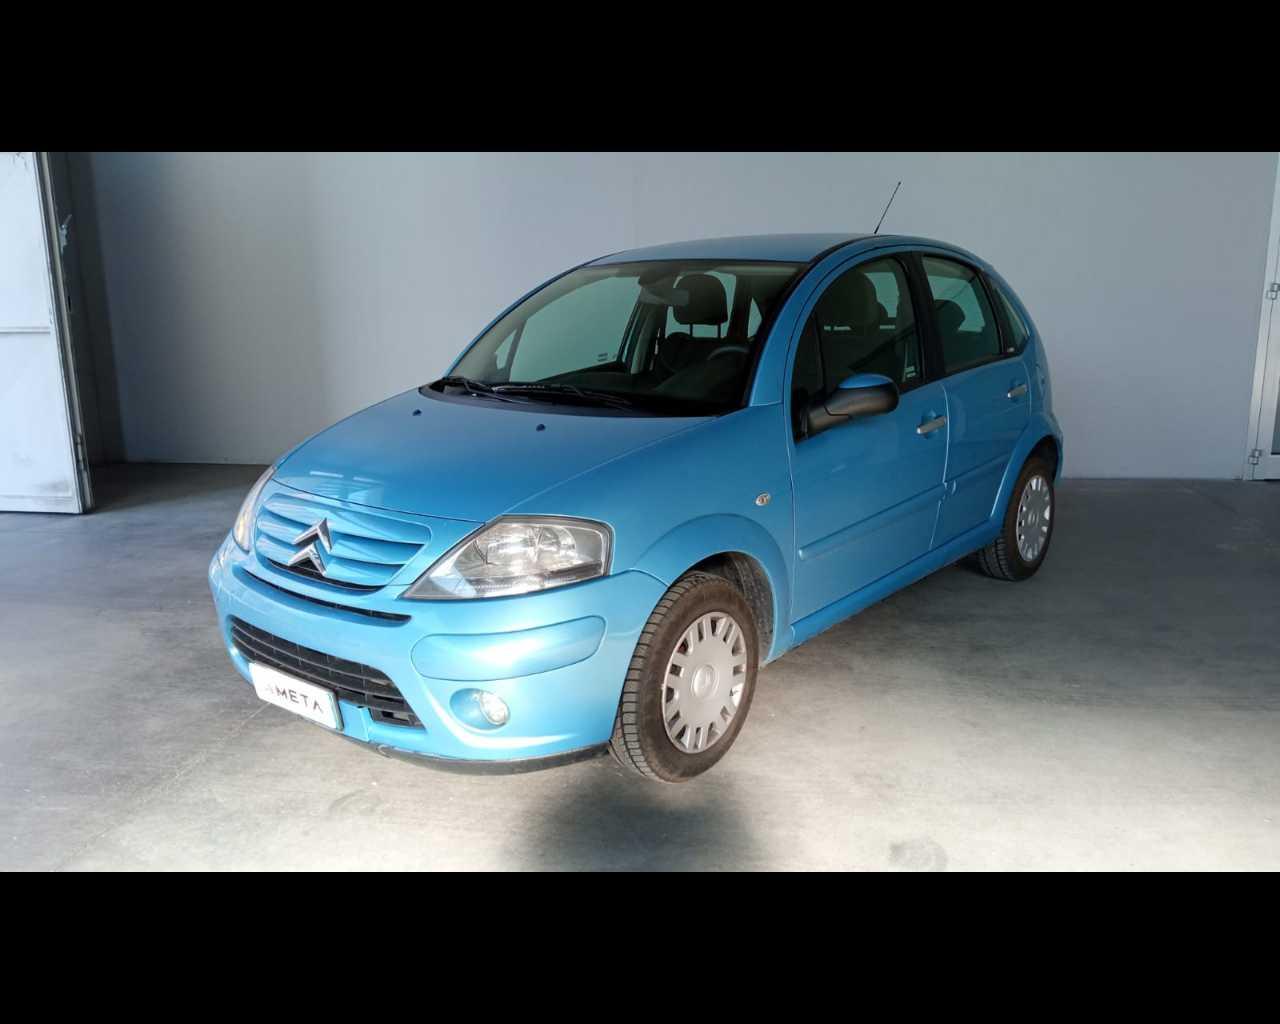 CITROEN  C3 1.1 Exclusive Style (exclusive), Benzina Verde, €2.800 - C3 I 2002 - C3 1.1 Exclusive Style (exclusive)